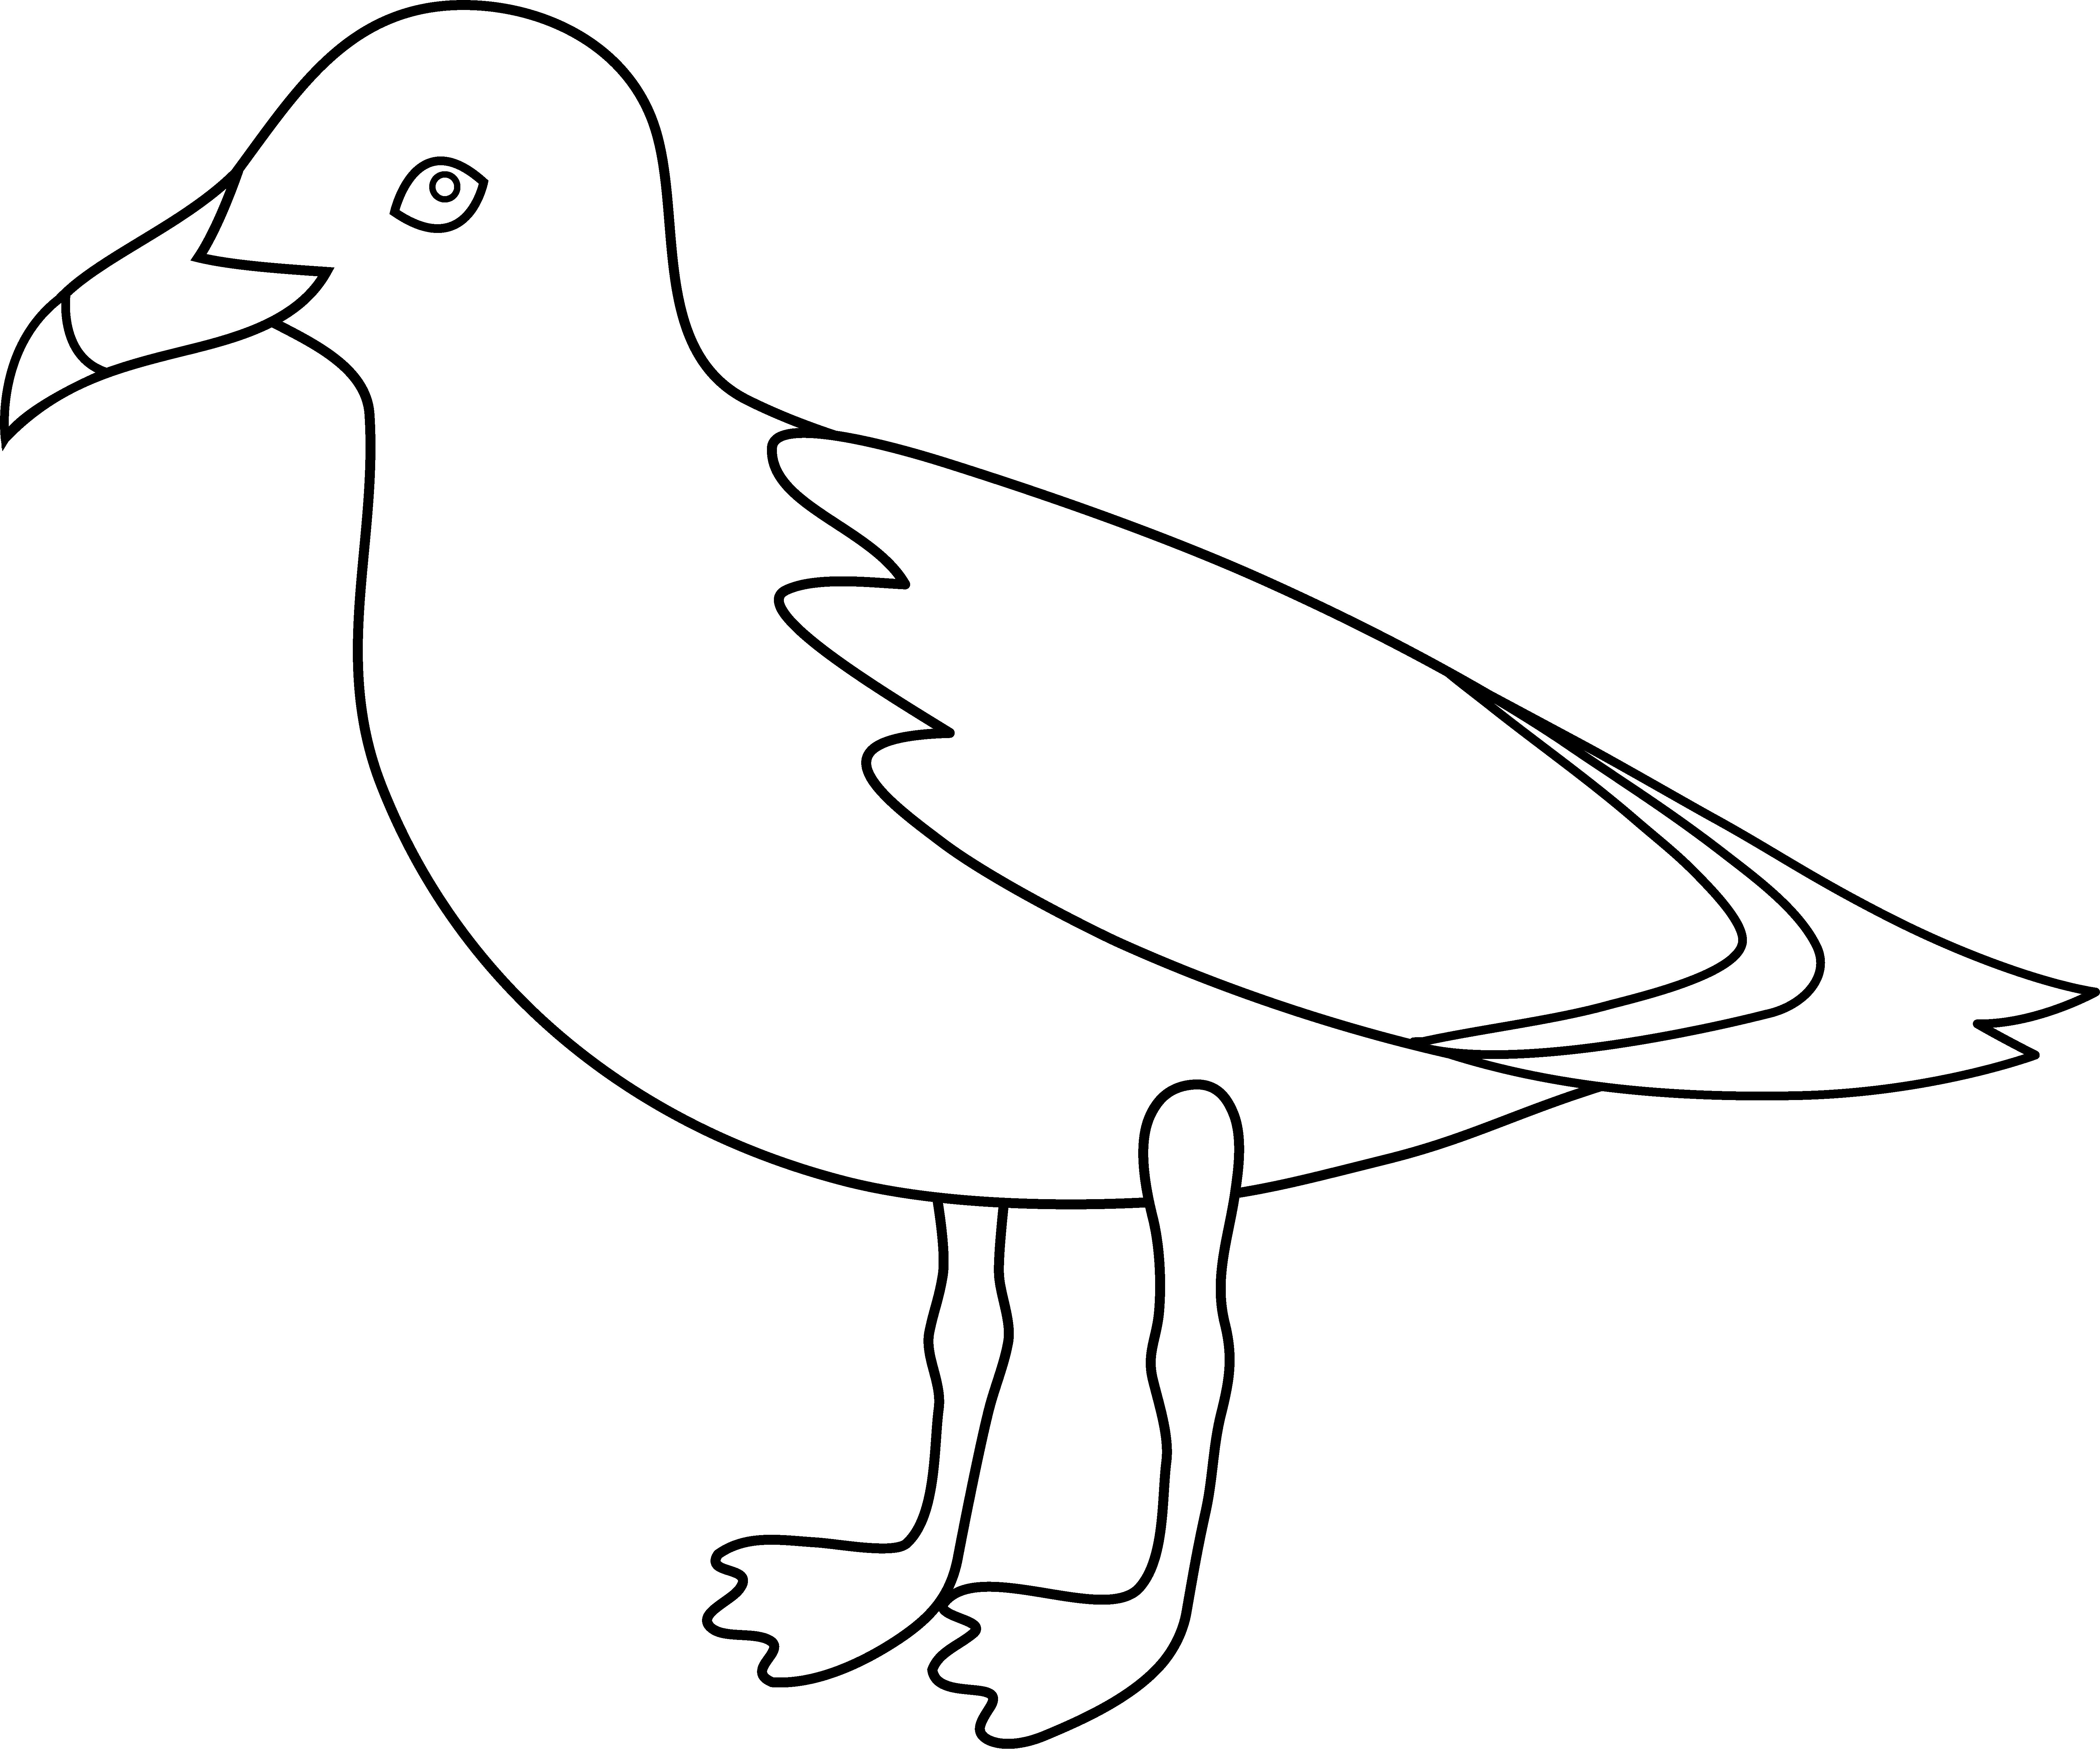 Simple Clip Art Line : Seagull outline cliparts